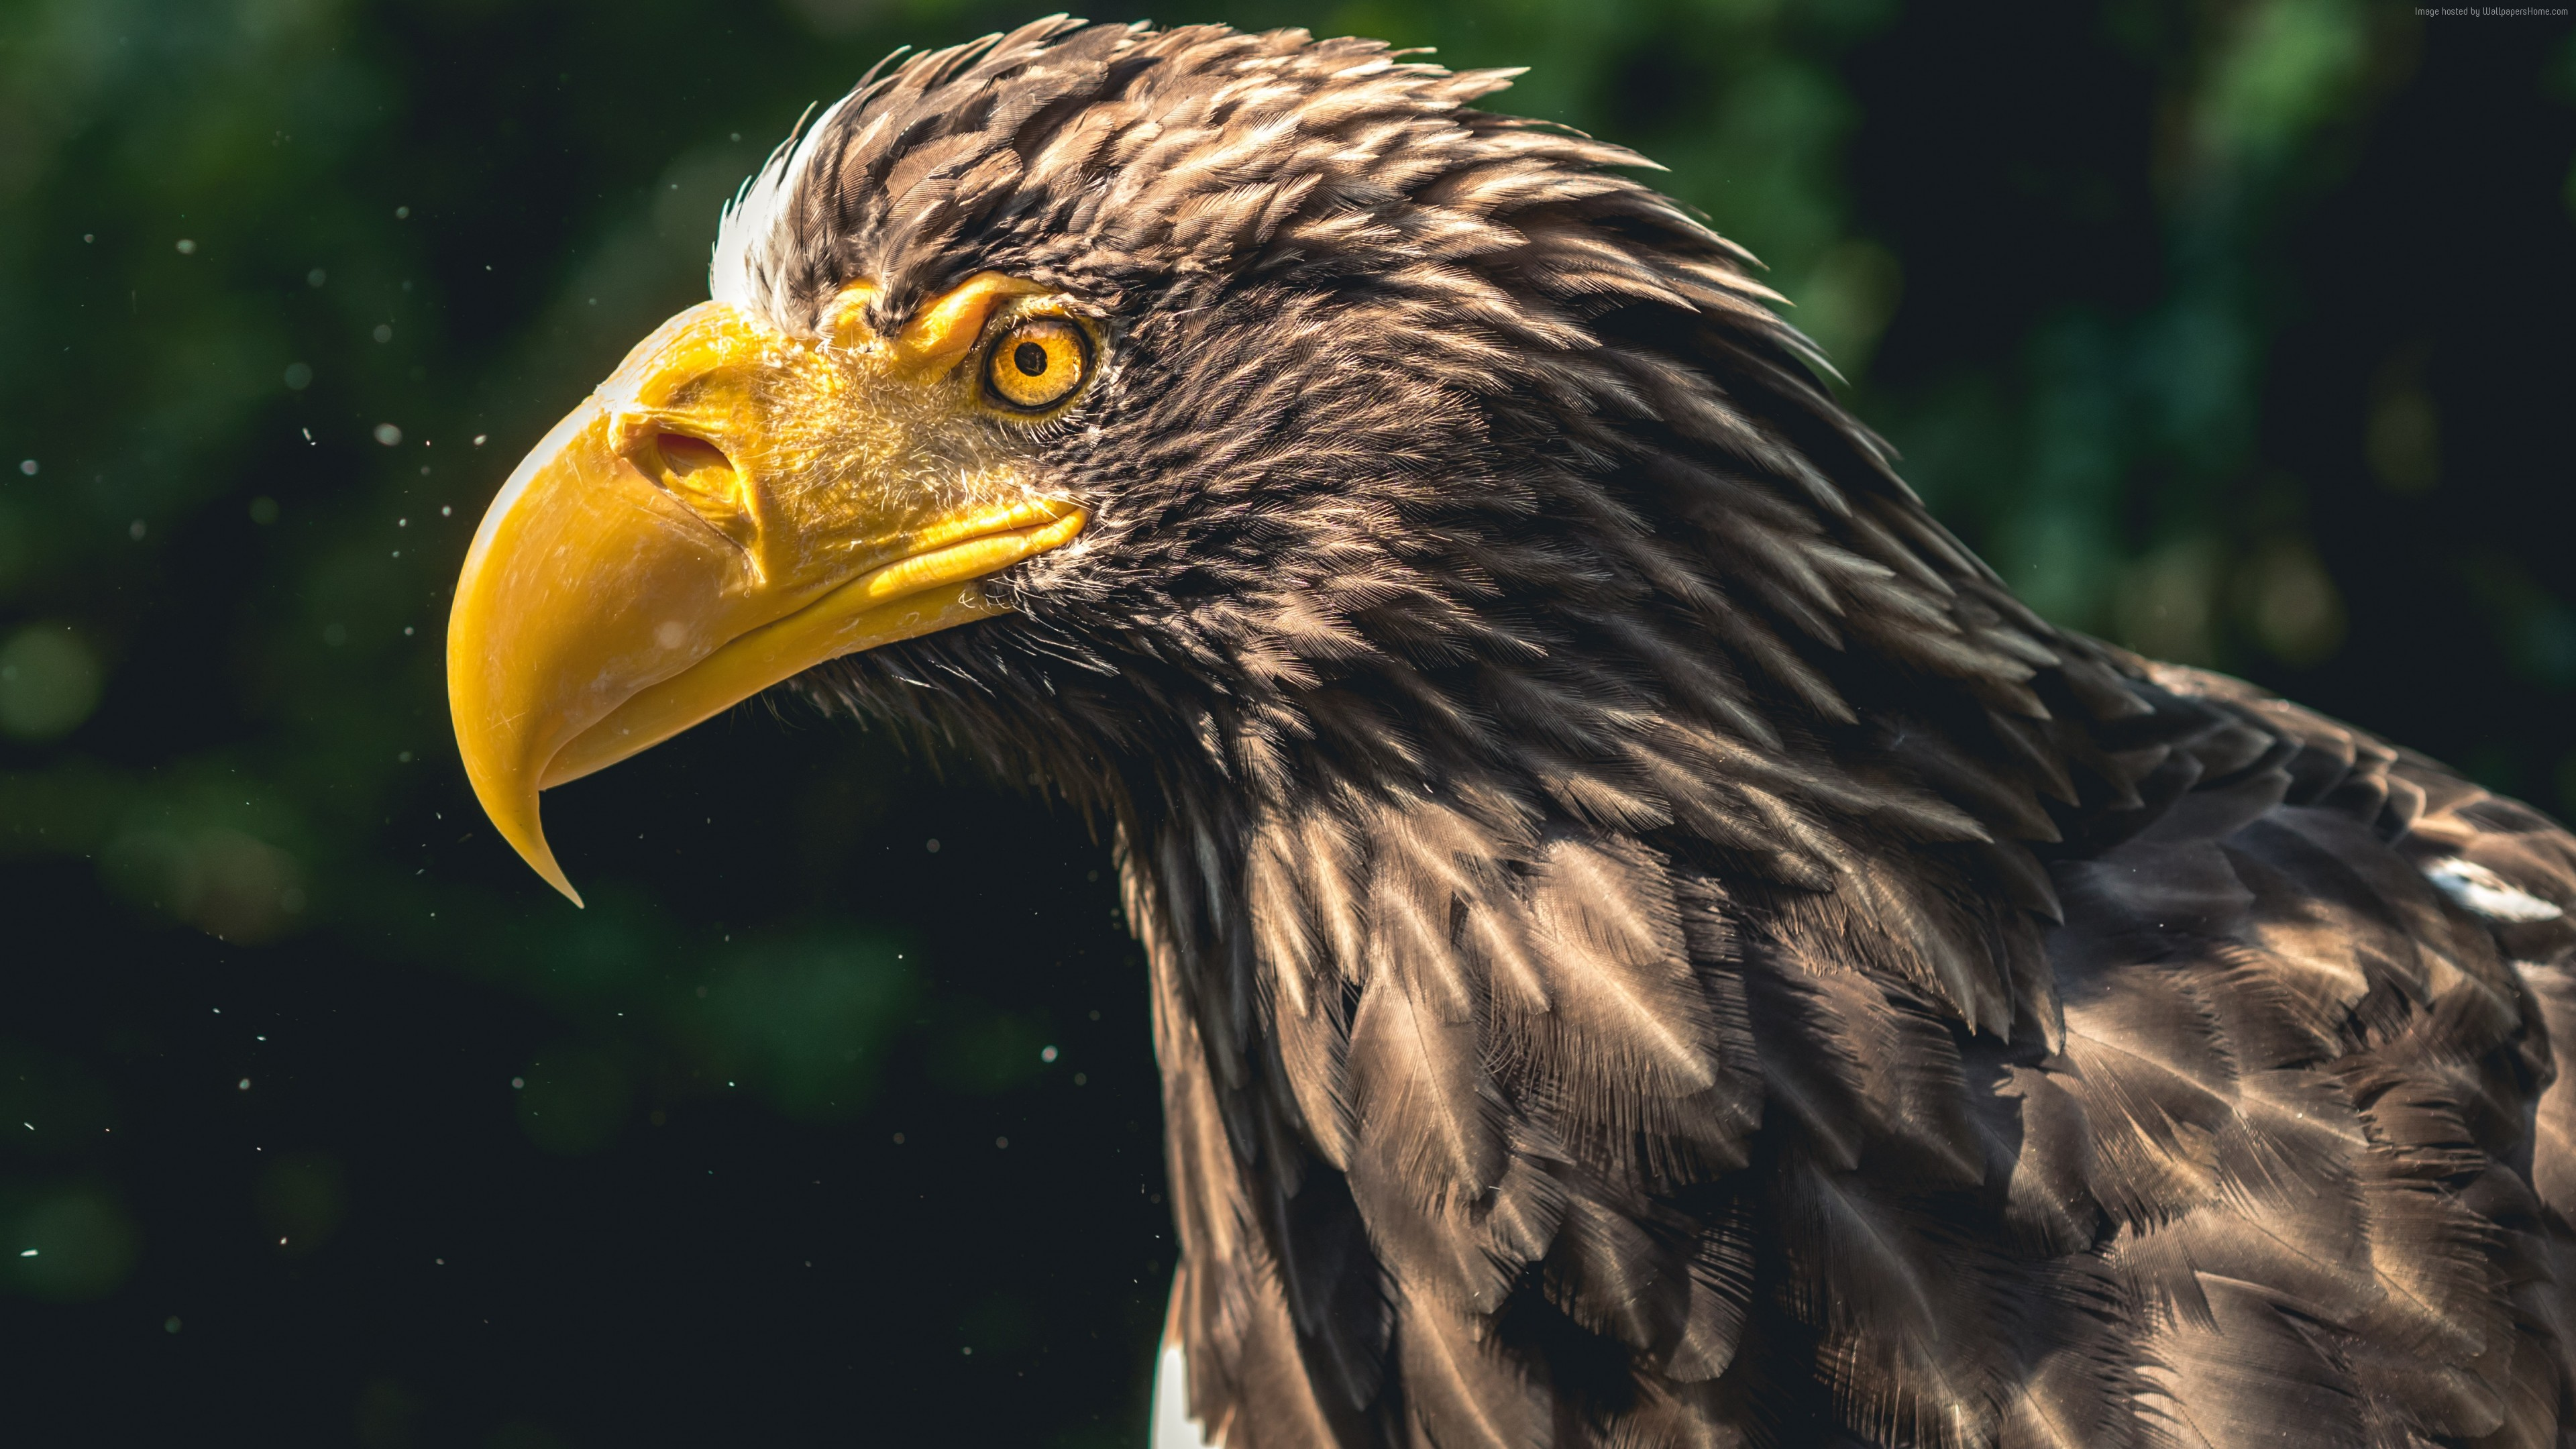 Stock Images Eagle Bird 4k Stock Images Wallpaper Download High Resolution 4k Wallpaper